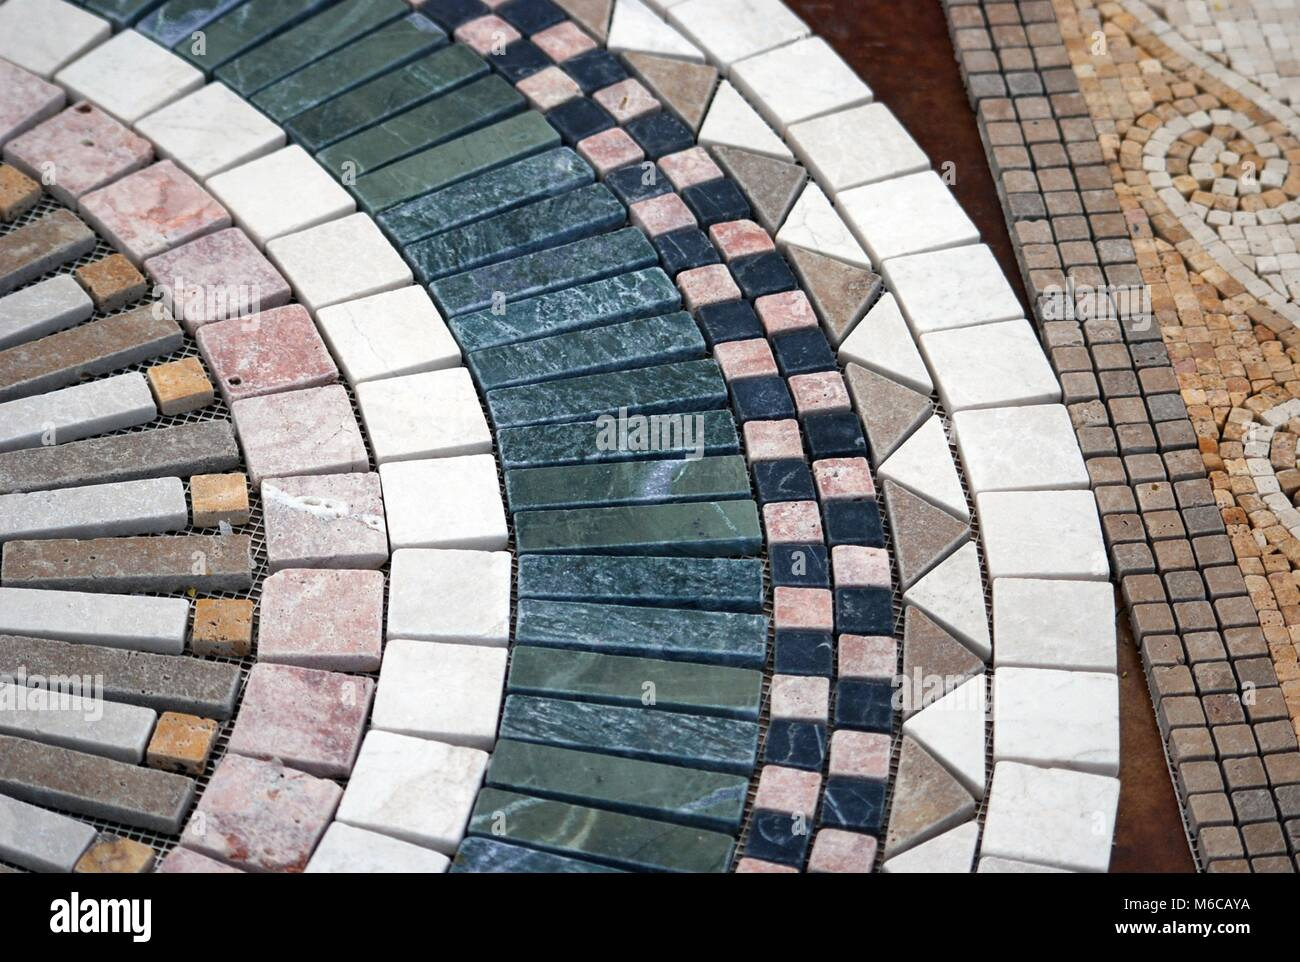 Decorative Ceramic Tiles Stock Photos Decorative Ceramic Tiles